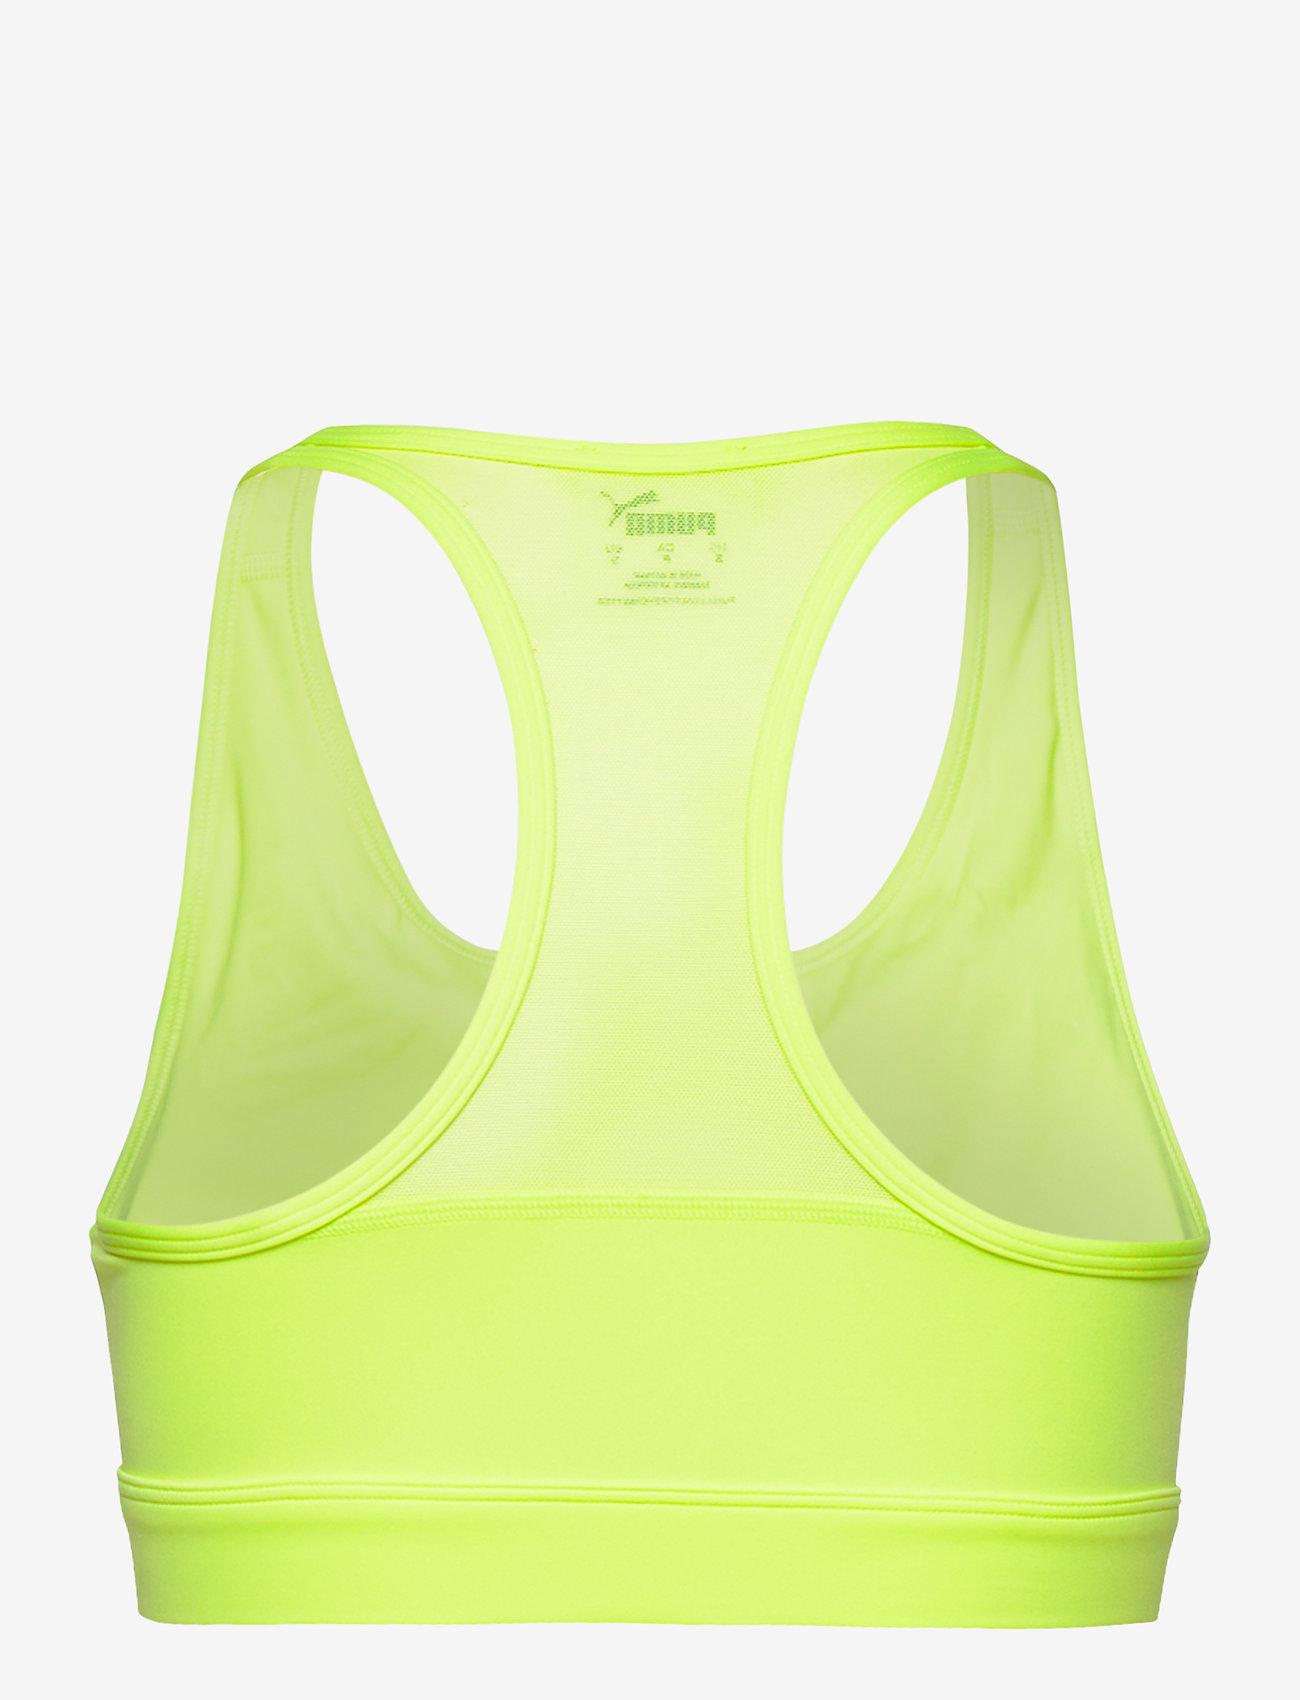 PUMA - High Impact Front Zip Bra - sort bras:high - fizzy yellow - 1